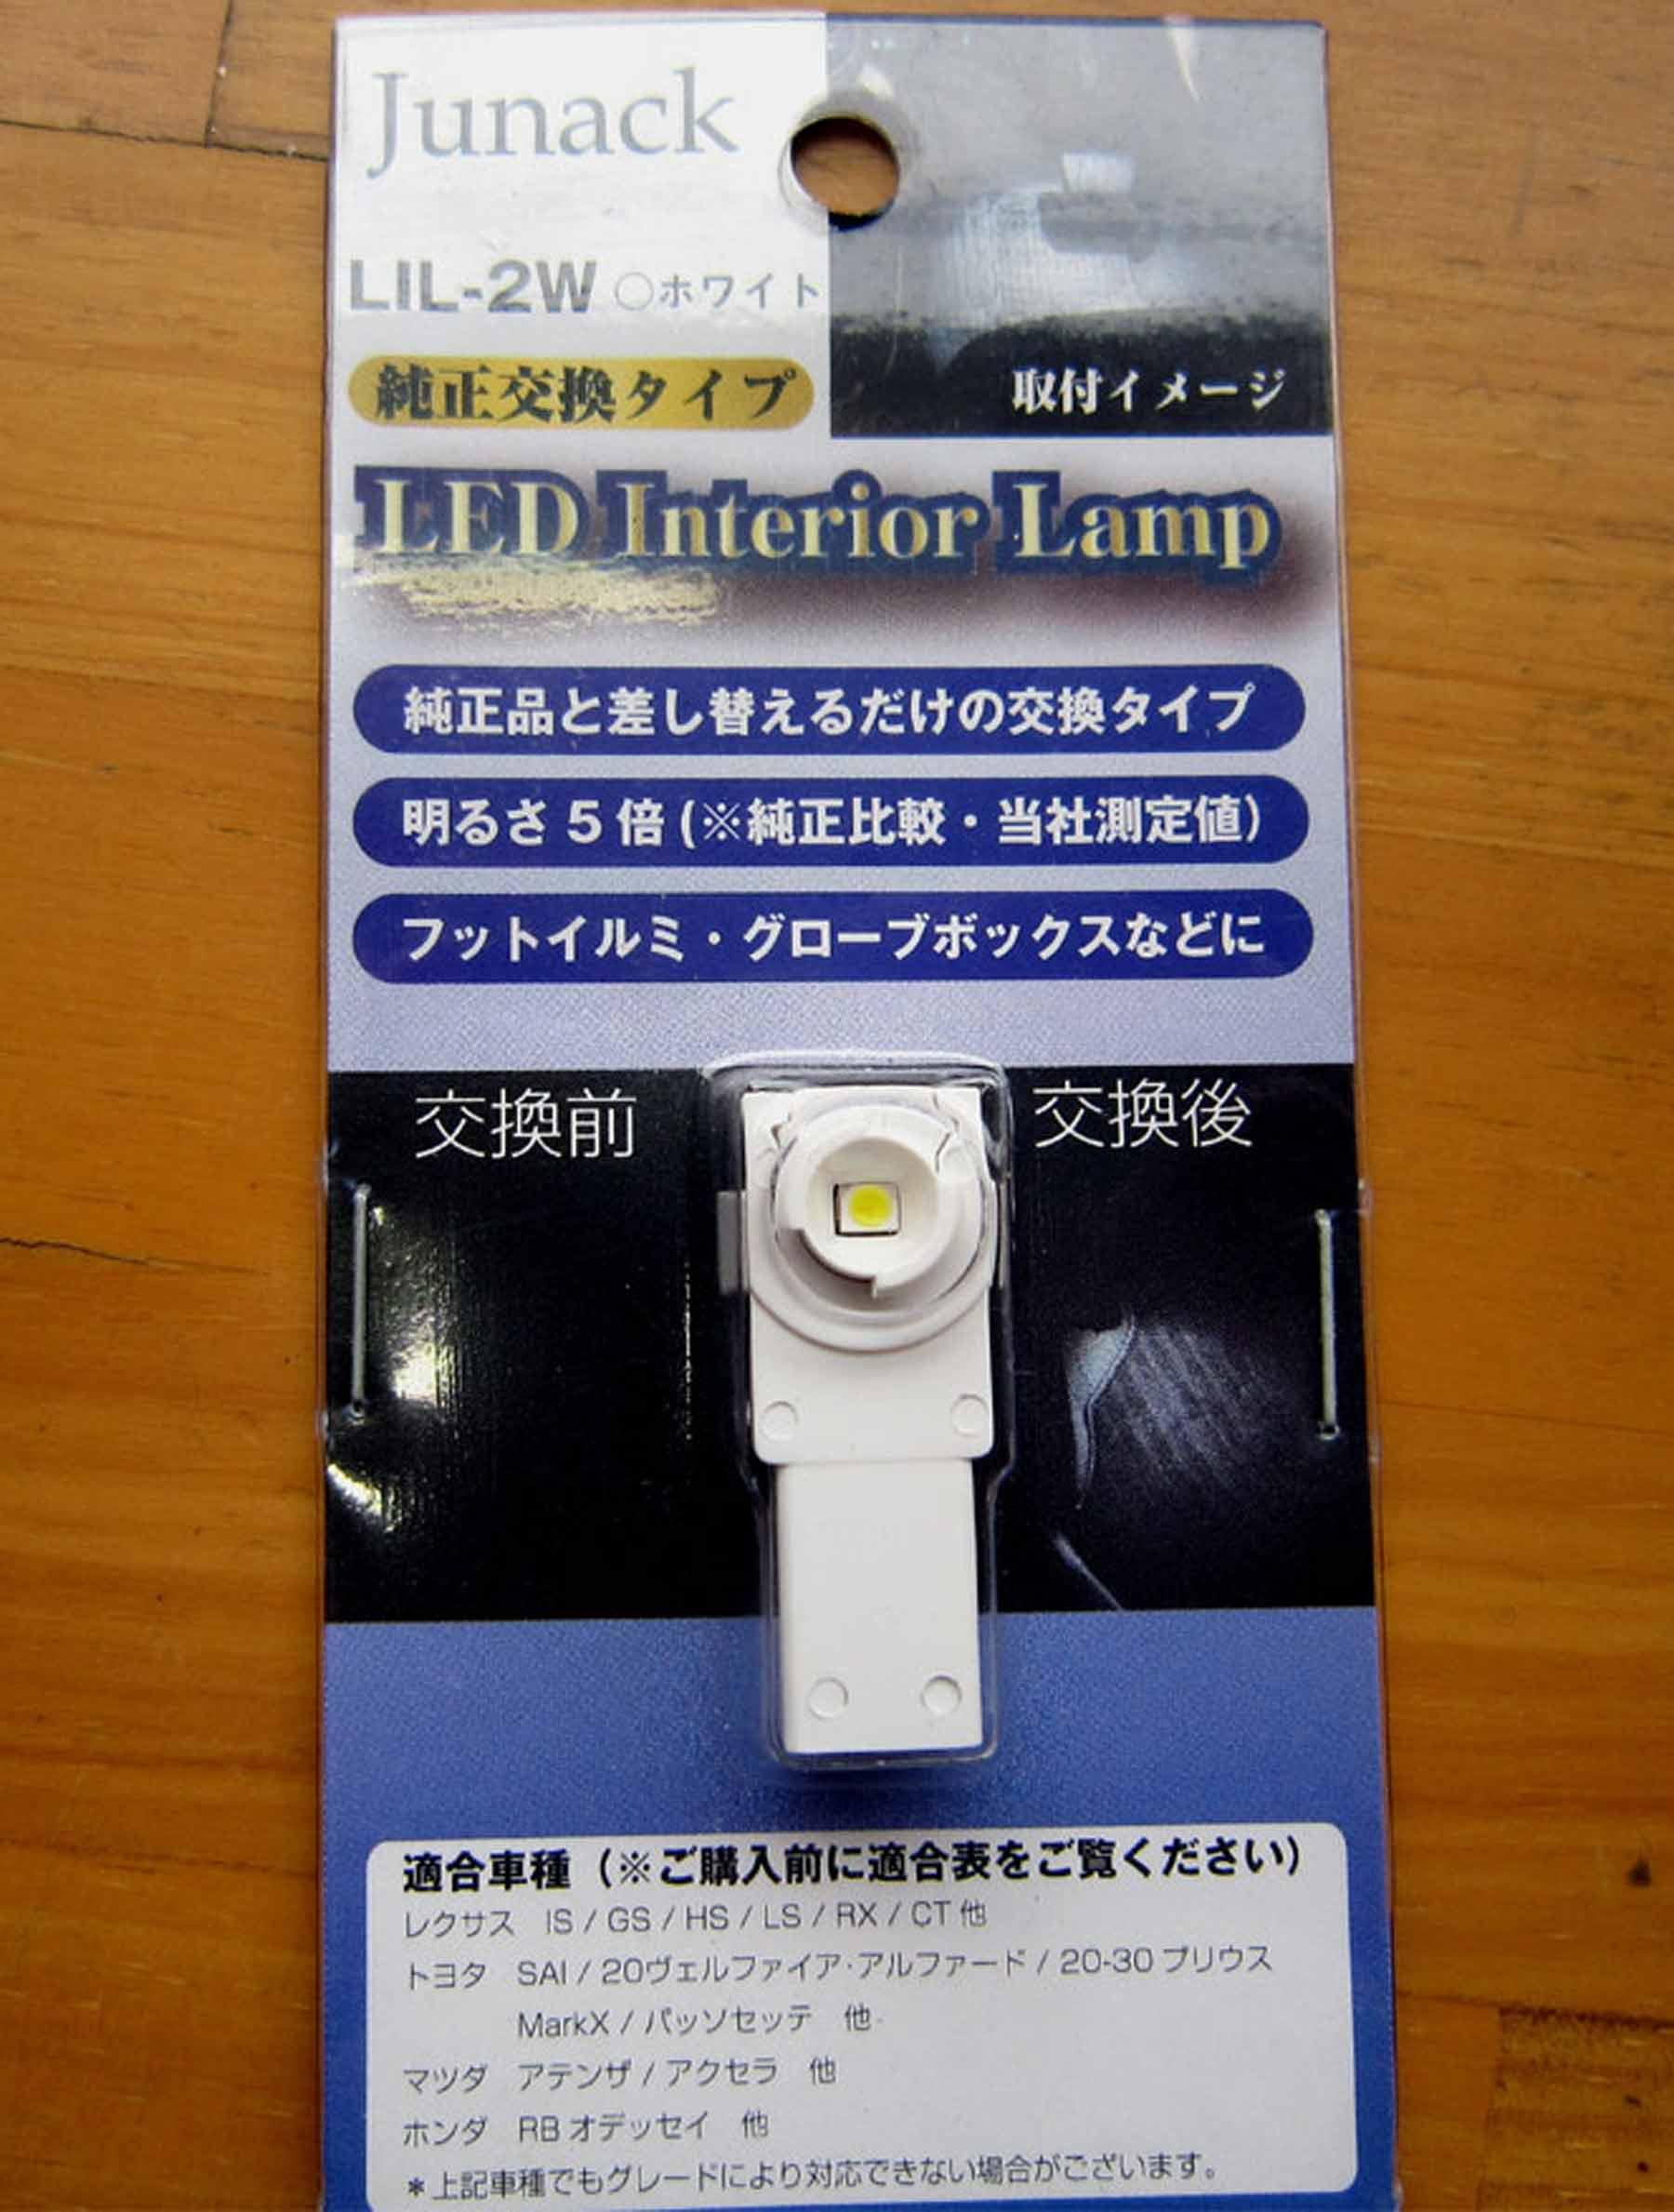 Junack LED インテリアランプ LIL-2W